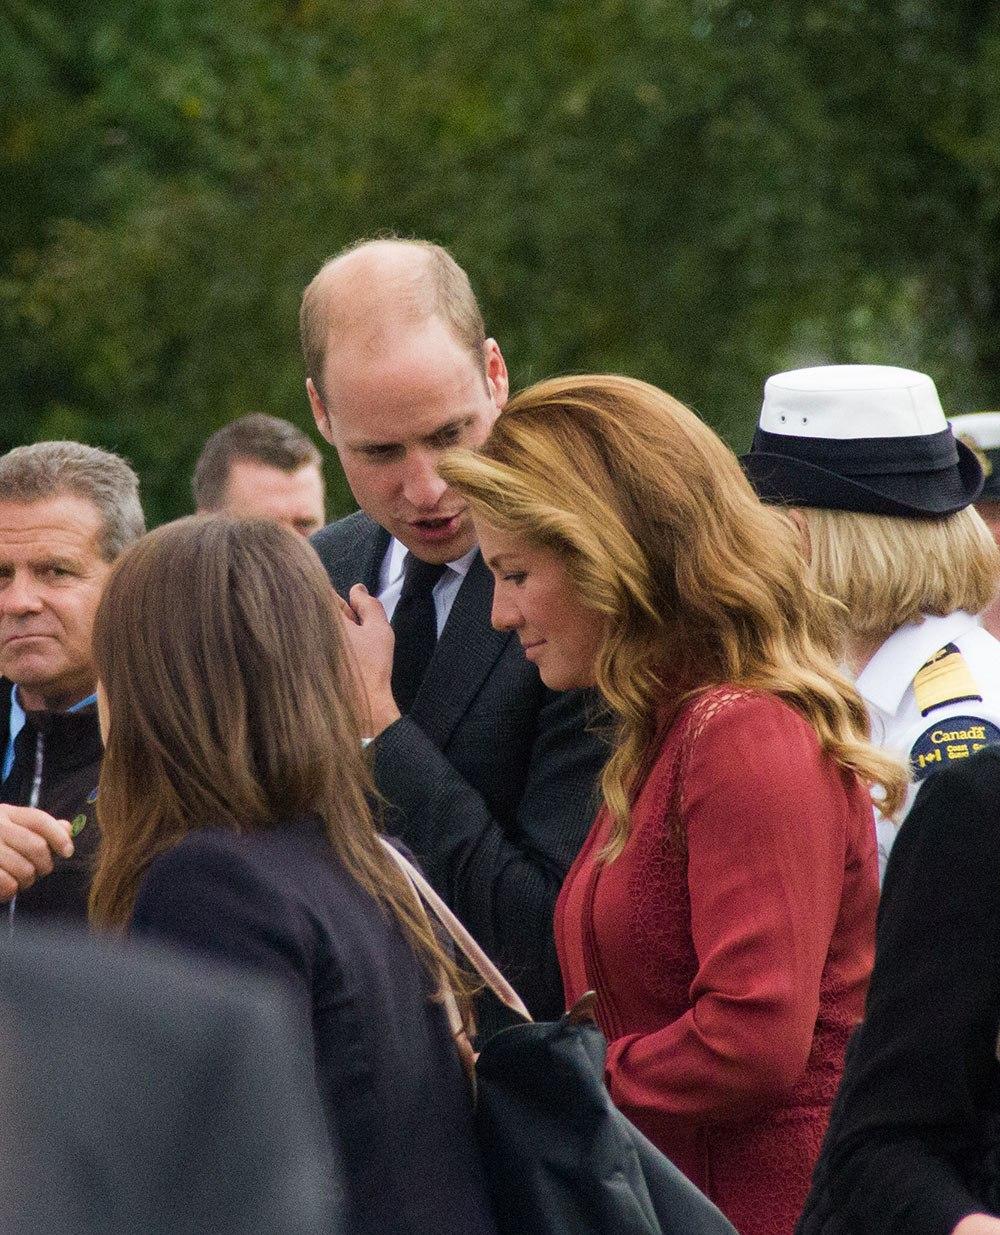 Prince William and Sophie Grégoire Trudeau at Kitsilano Coast Guard Station (Jenni Sheppard/Daily Hive)